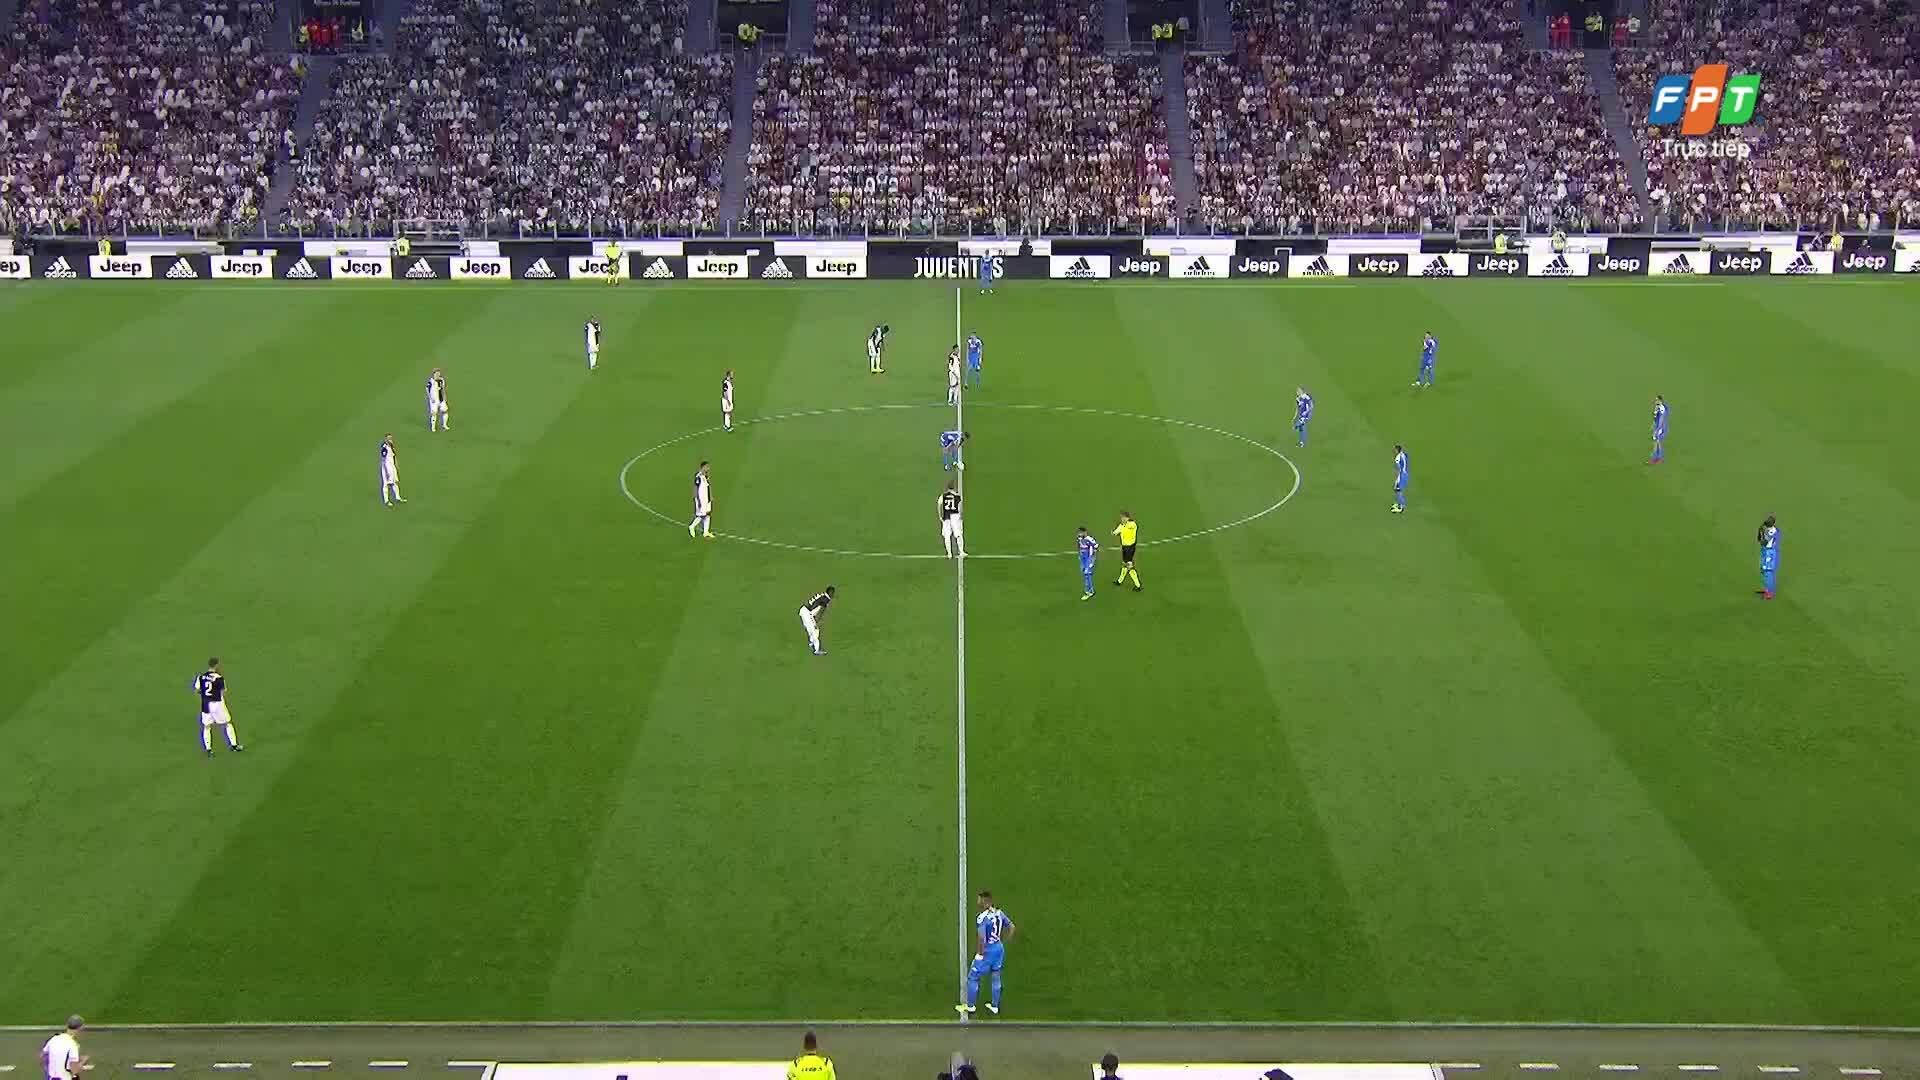 Juventus 4-3 Napoli